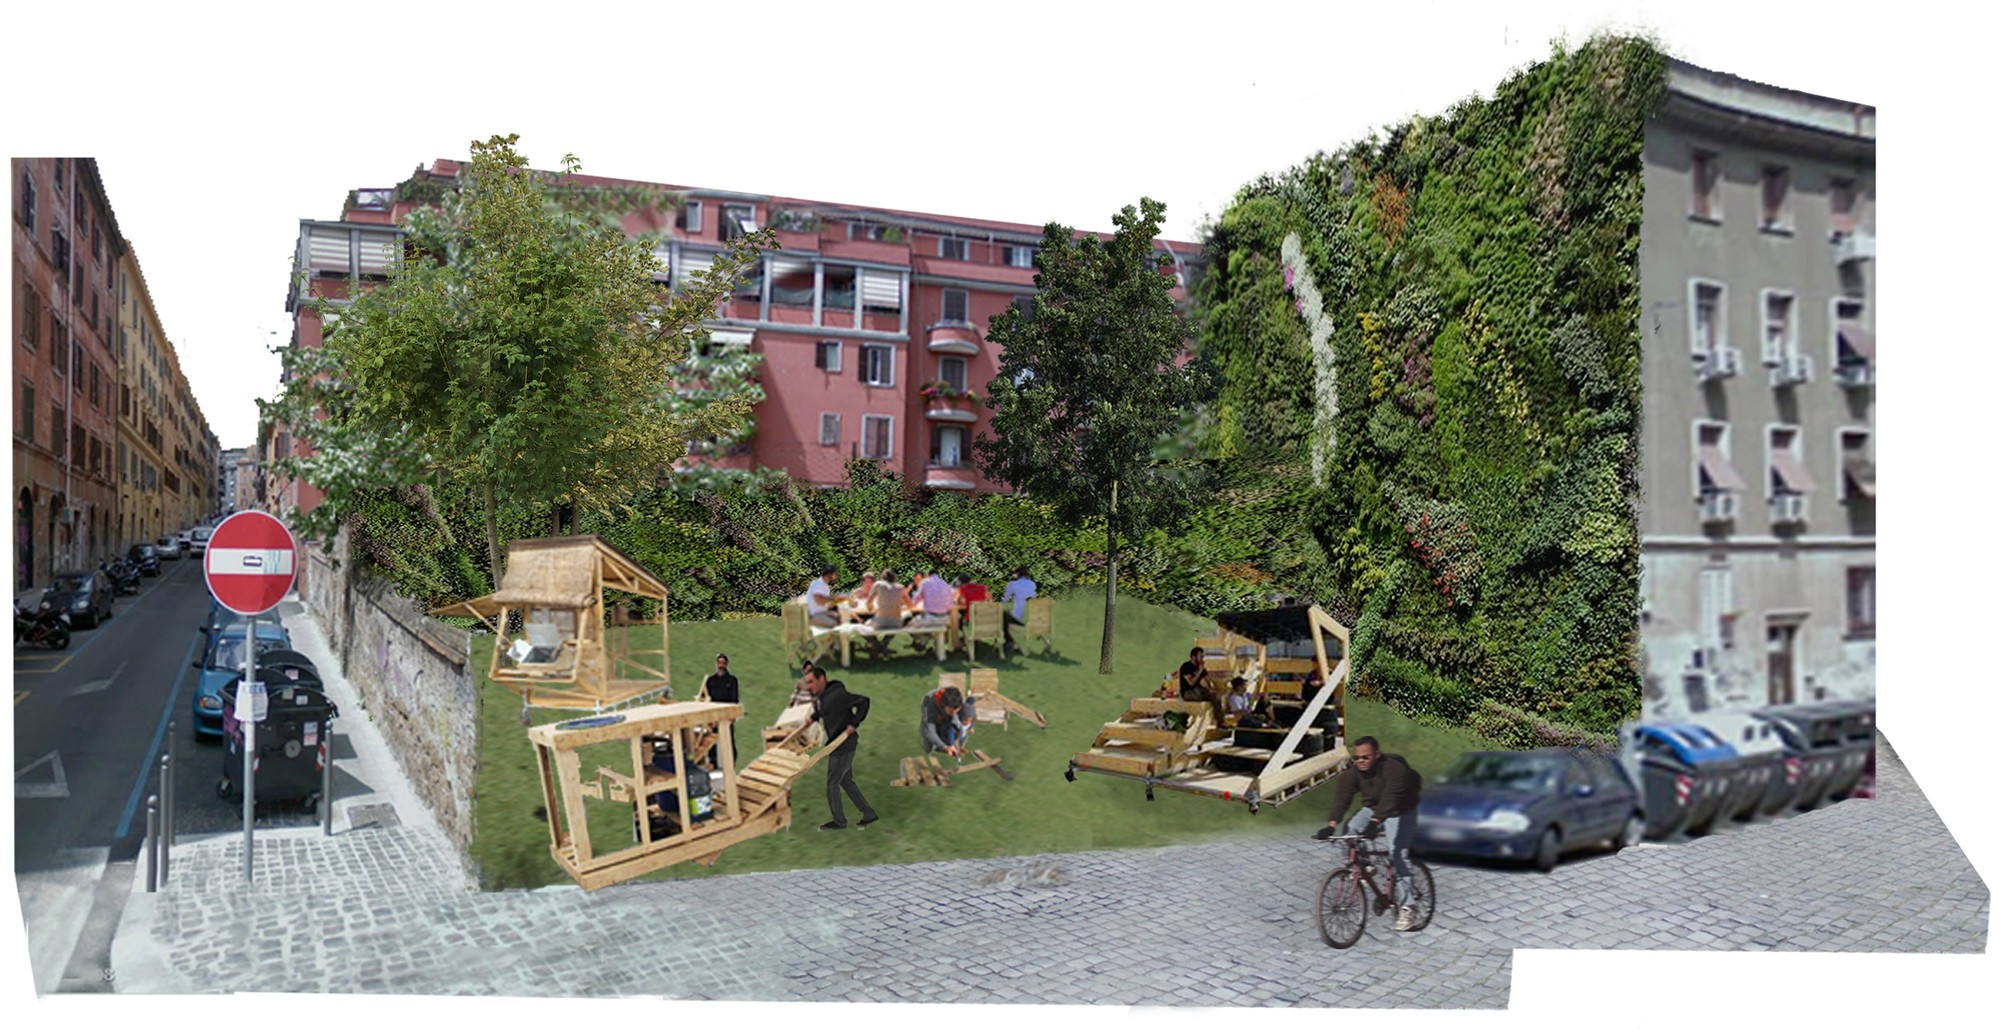 Italia [Después]. Image Courtesy of Aula de Arquitectura Social AAS UCAM